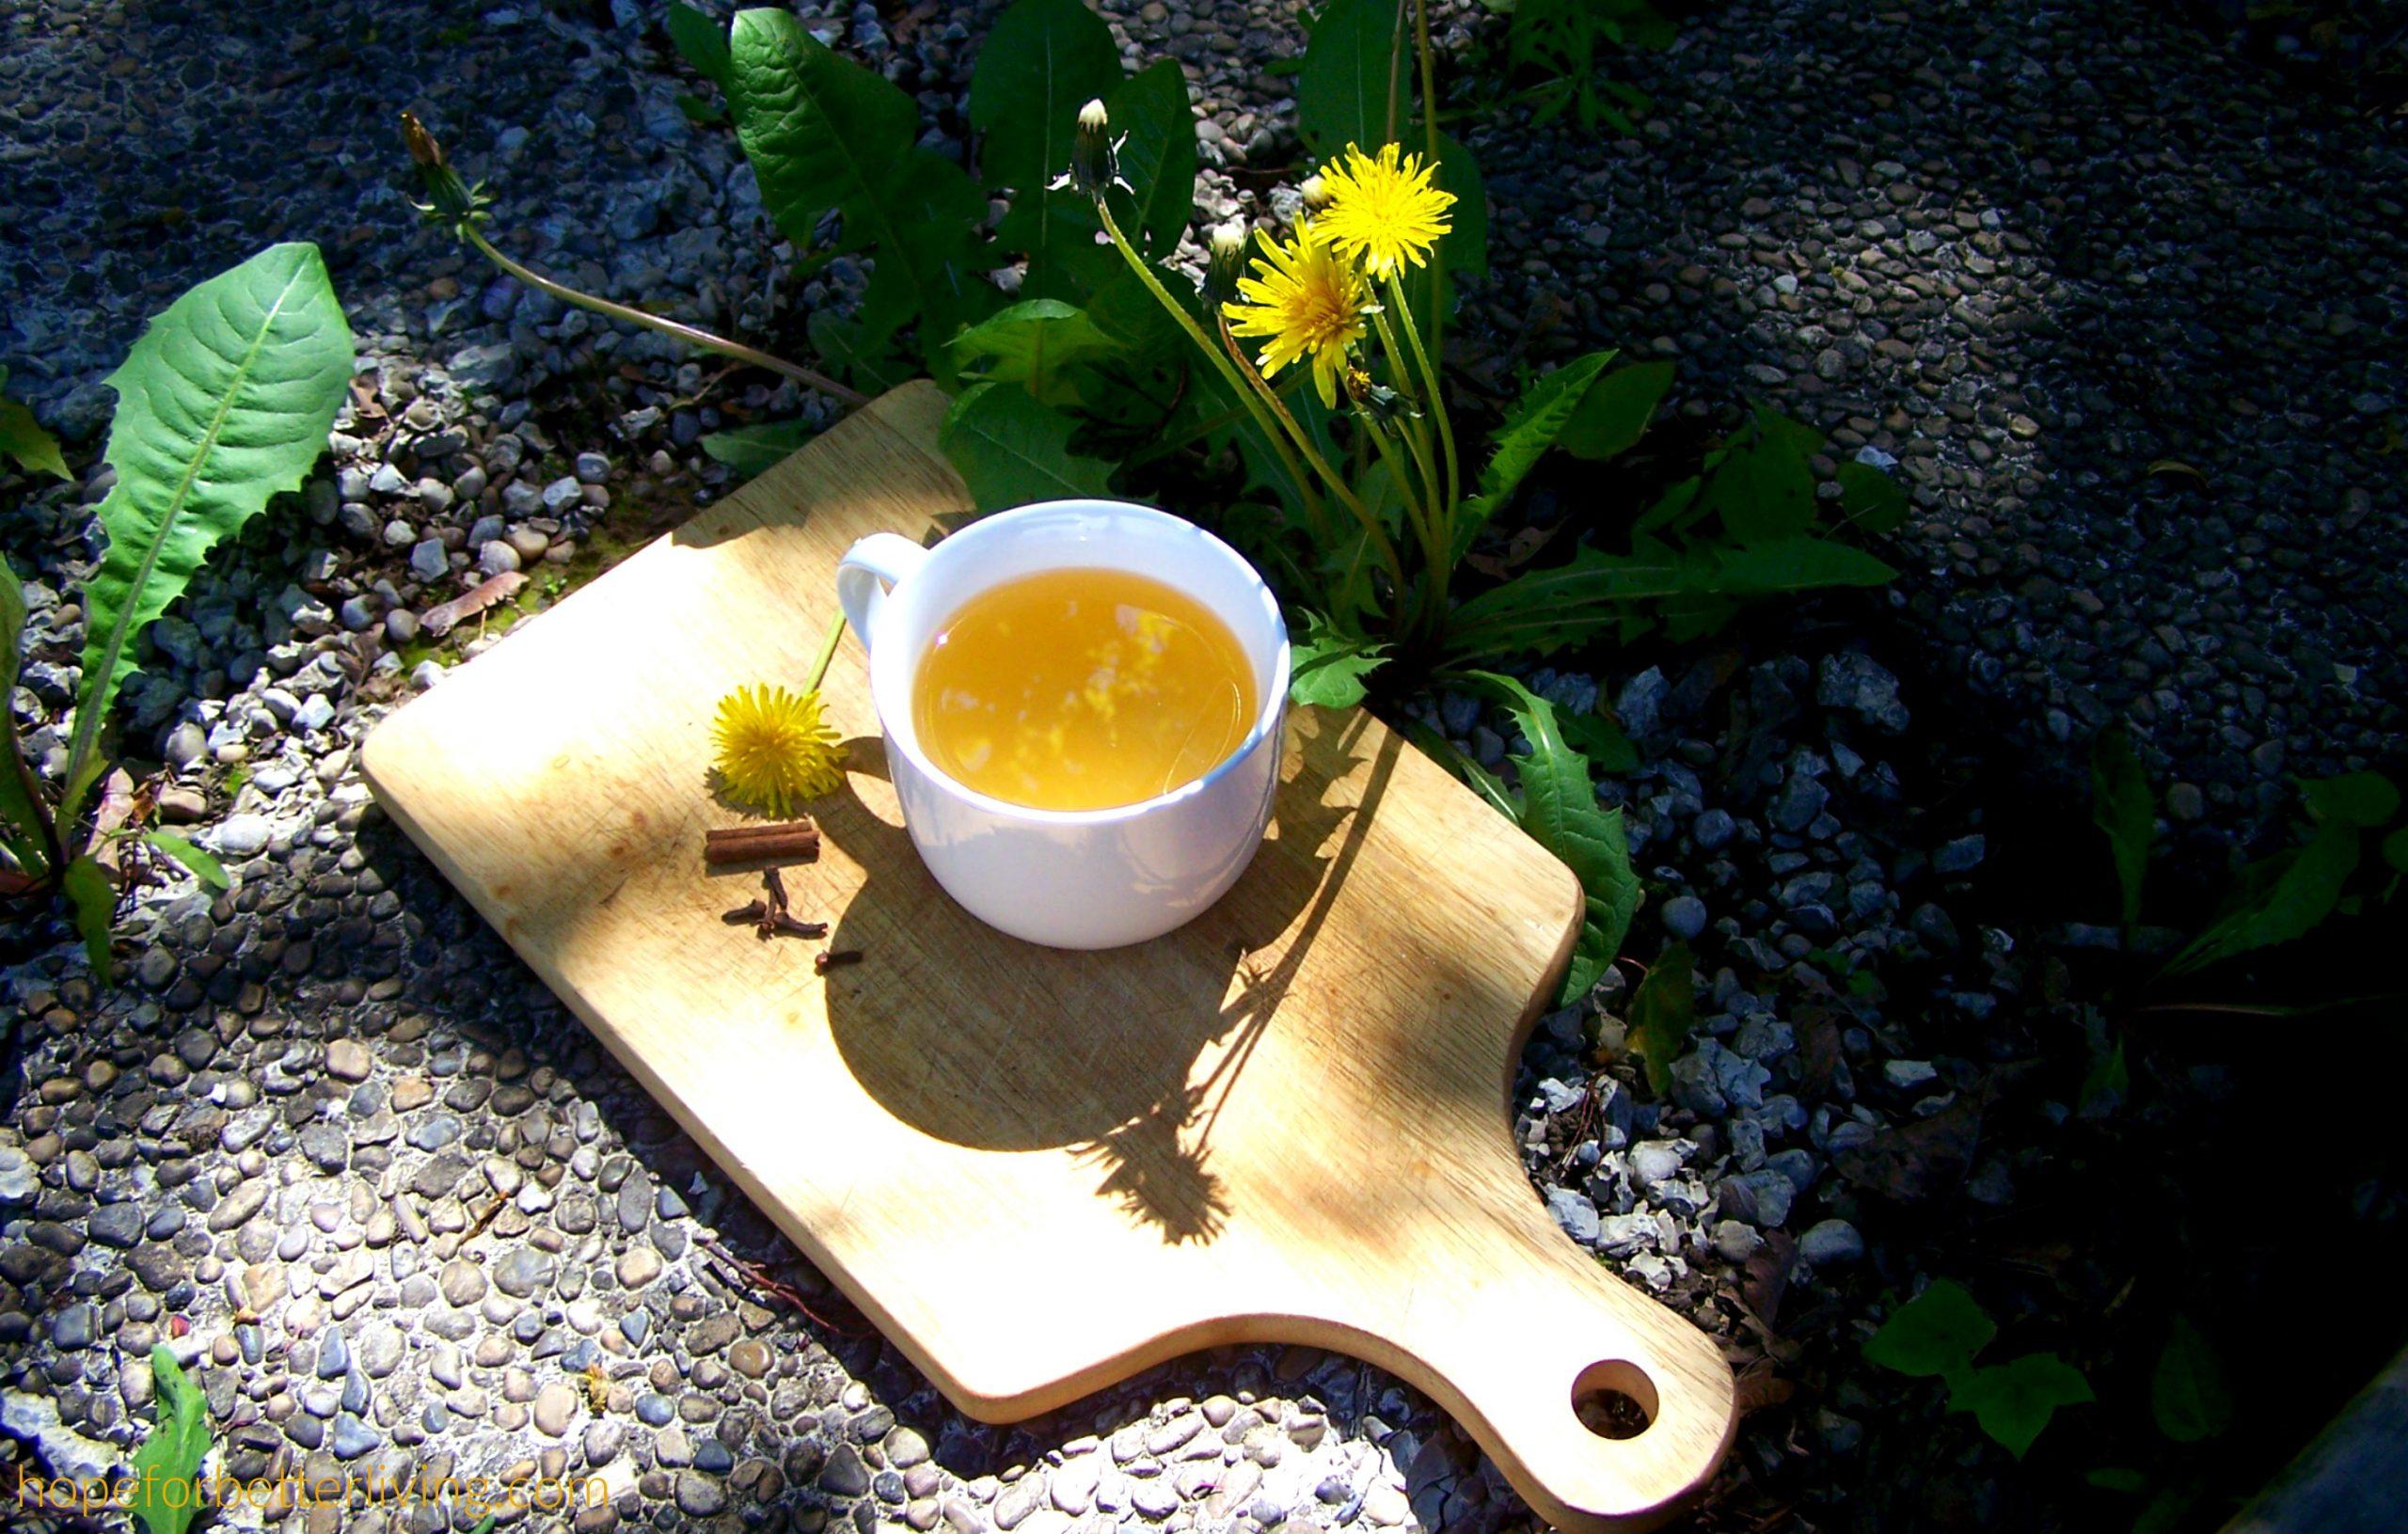 How to Make Spiced Dandelion Tea